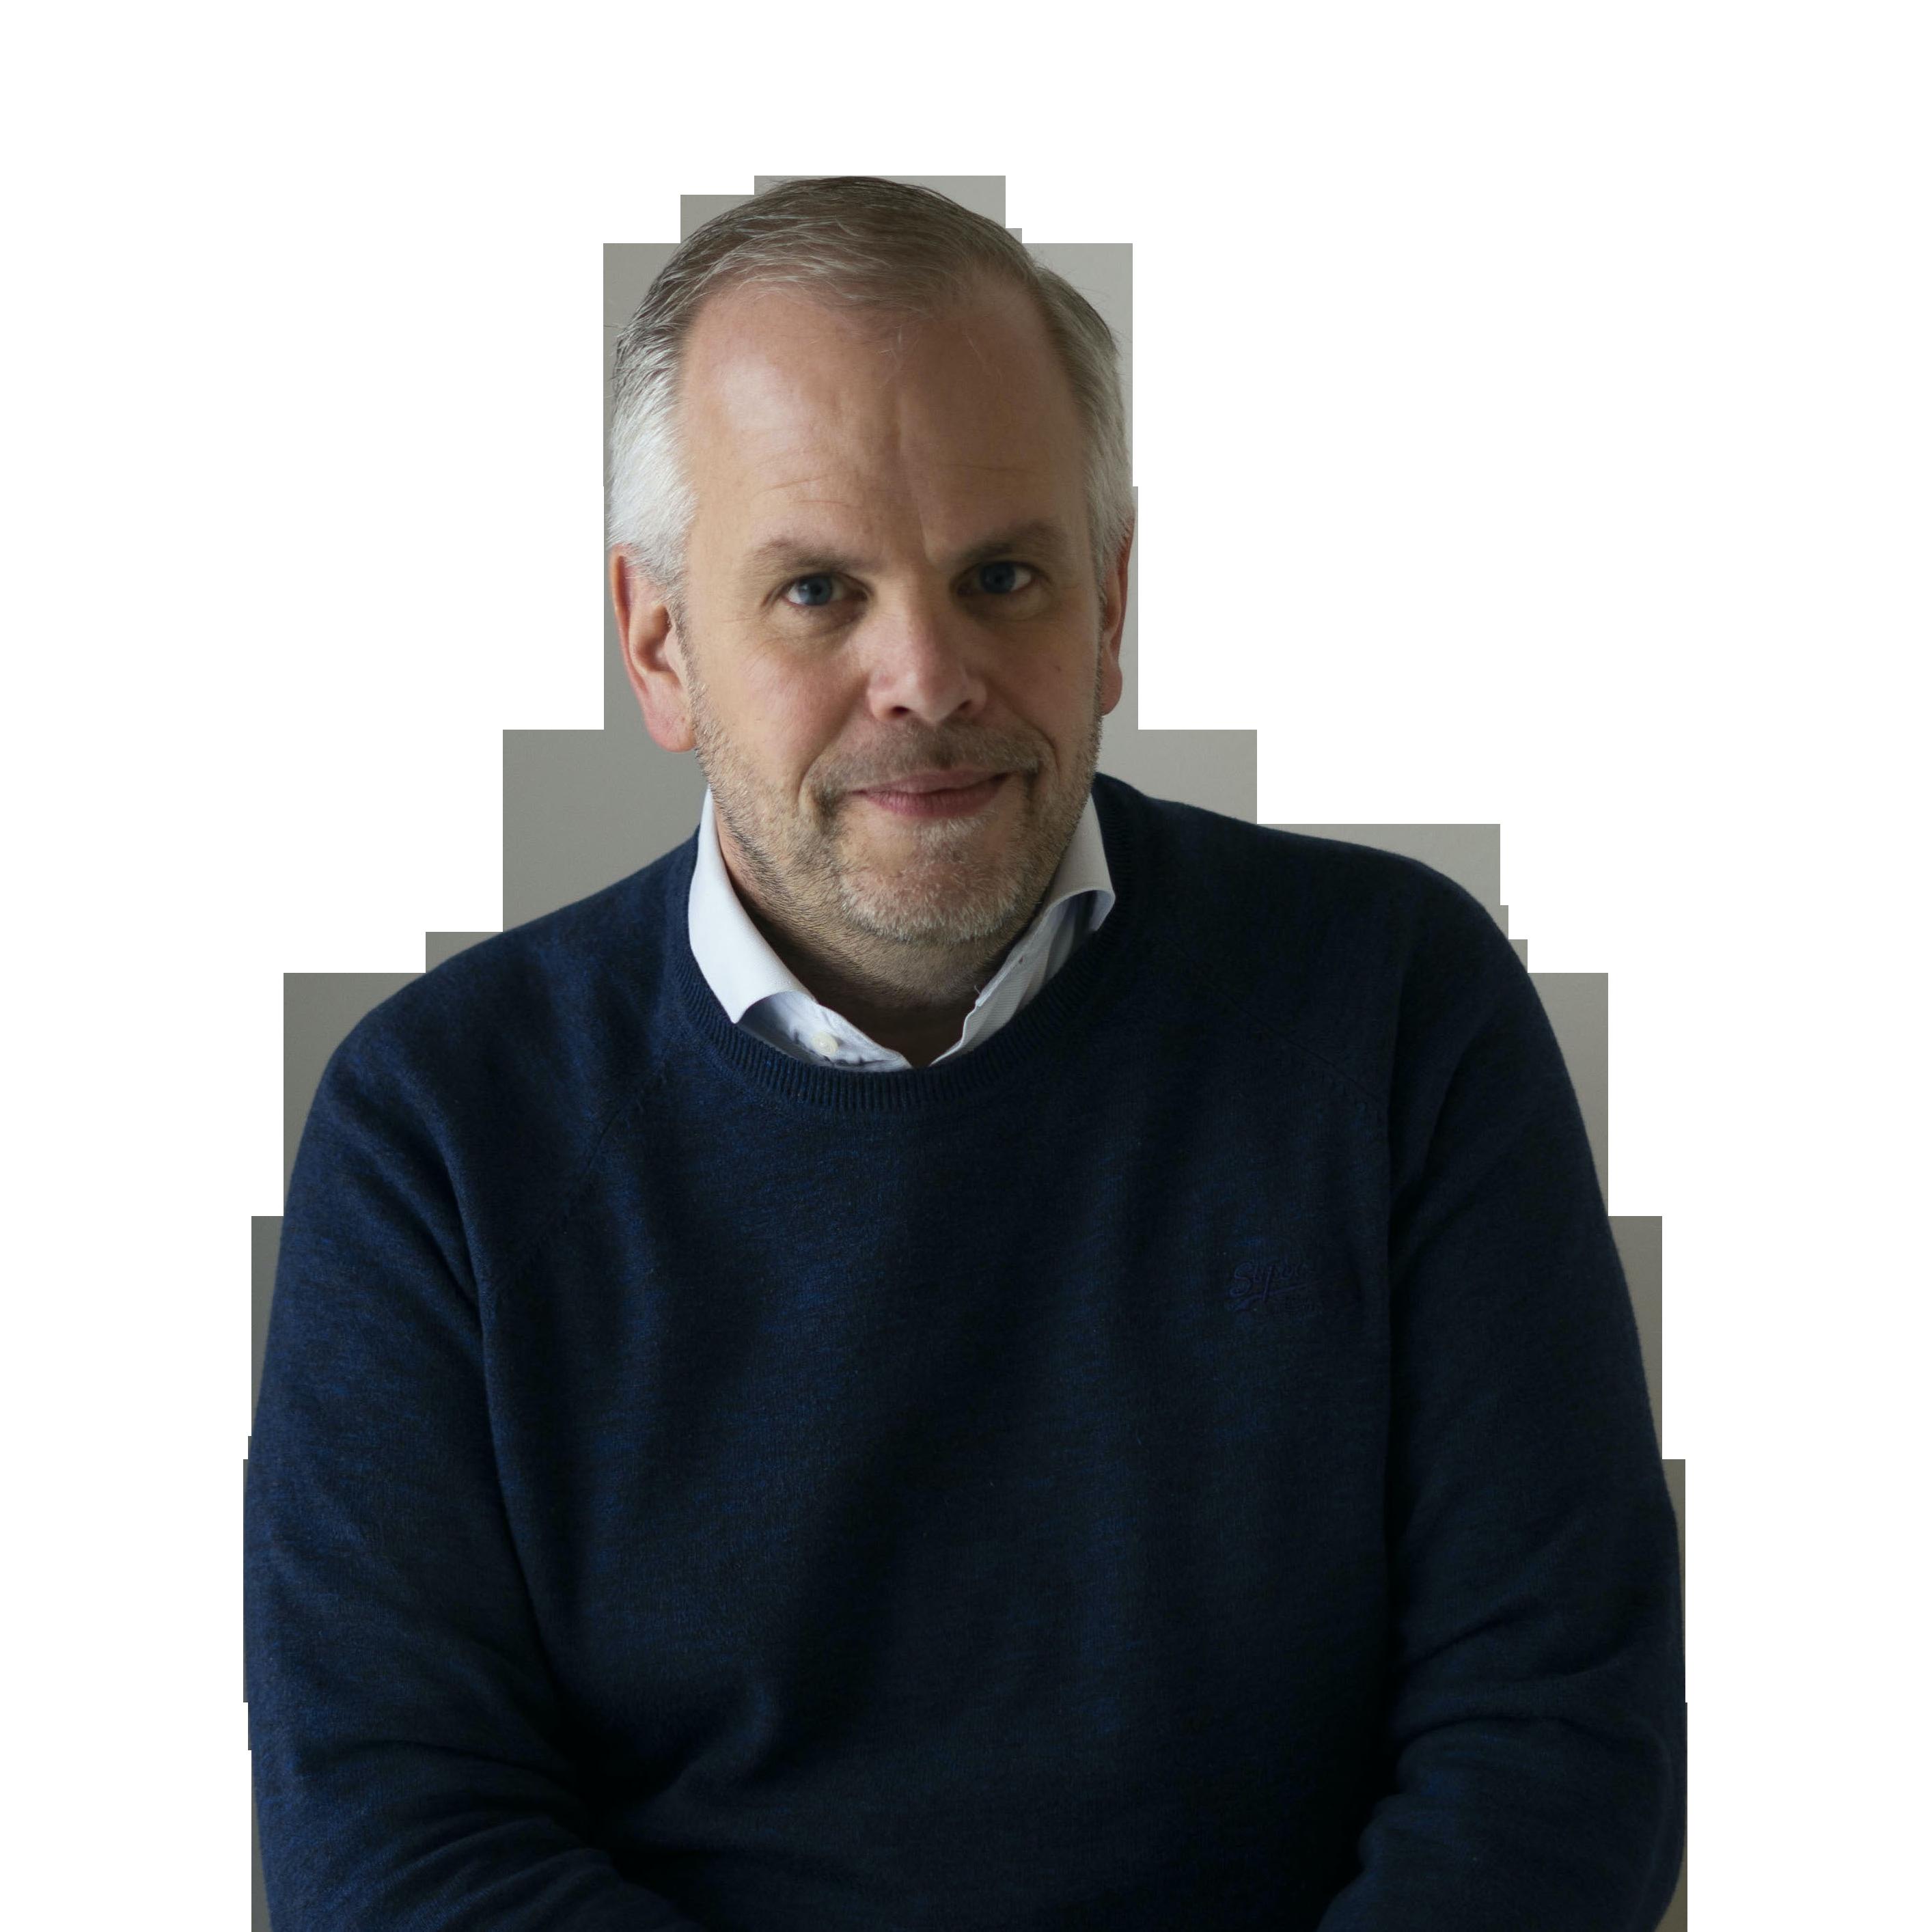 MfN registermediator en scheidingsbemiddelaar Willem Poelmann